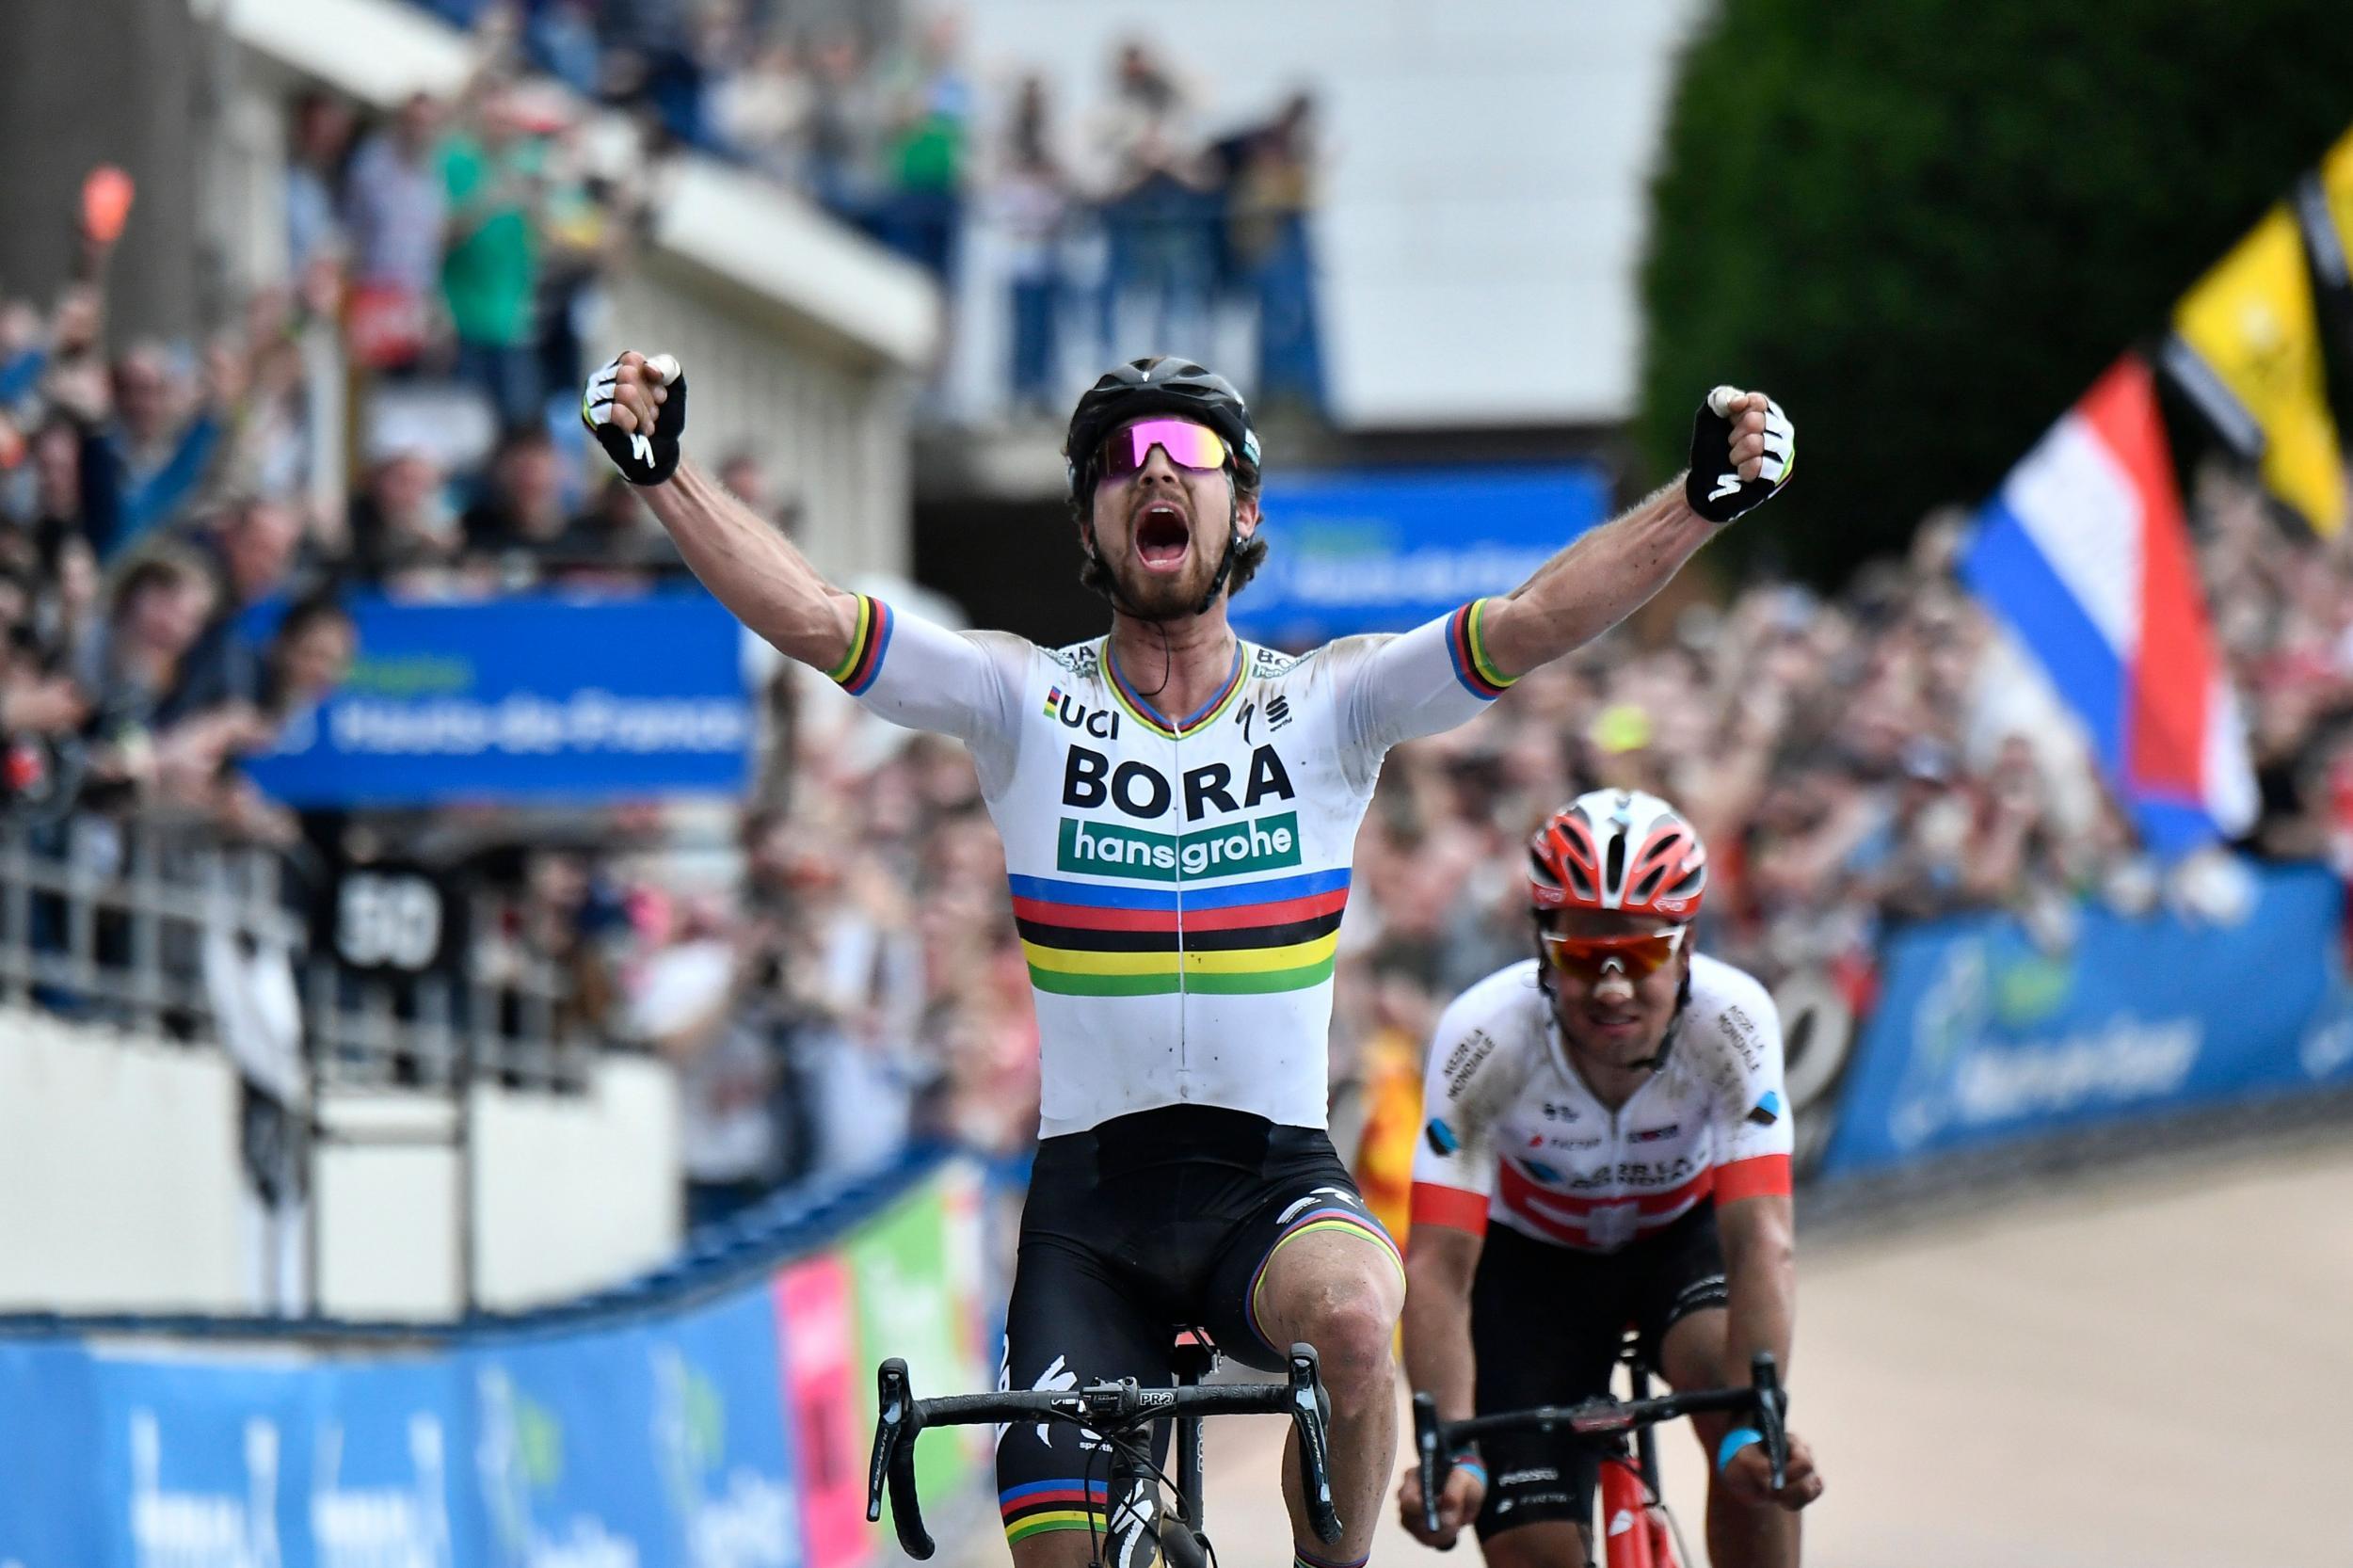 Peter Sagan's Paris-Roubaix win overshadowed by concern for Michael Goolaerts after cardiac arrest